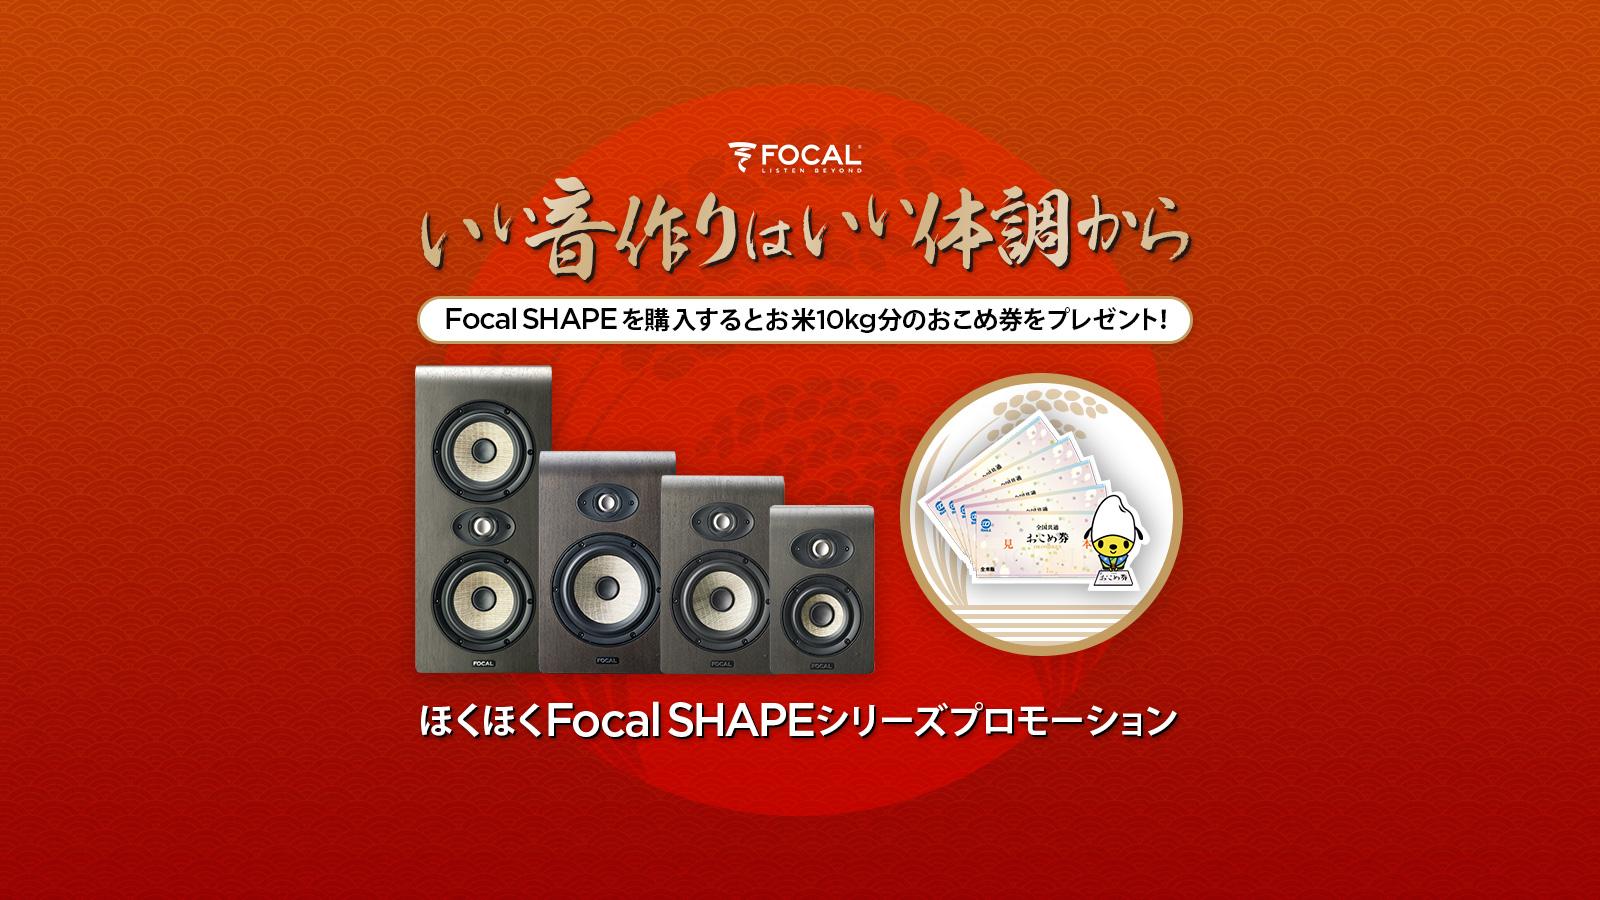 FOCAL PROFESSIONAL SHAPE 65(ペア)【ペア購入対象:10kg分のおこめ券プレゼント】